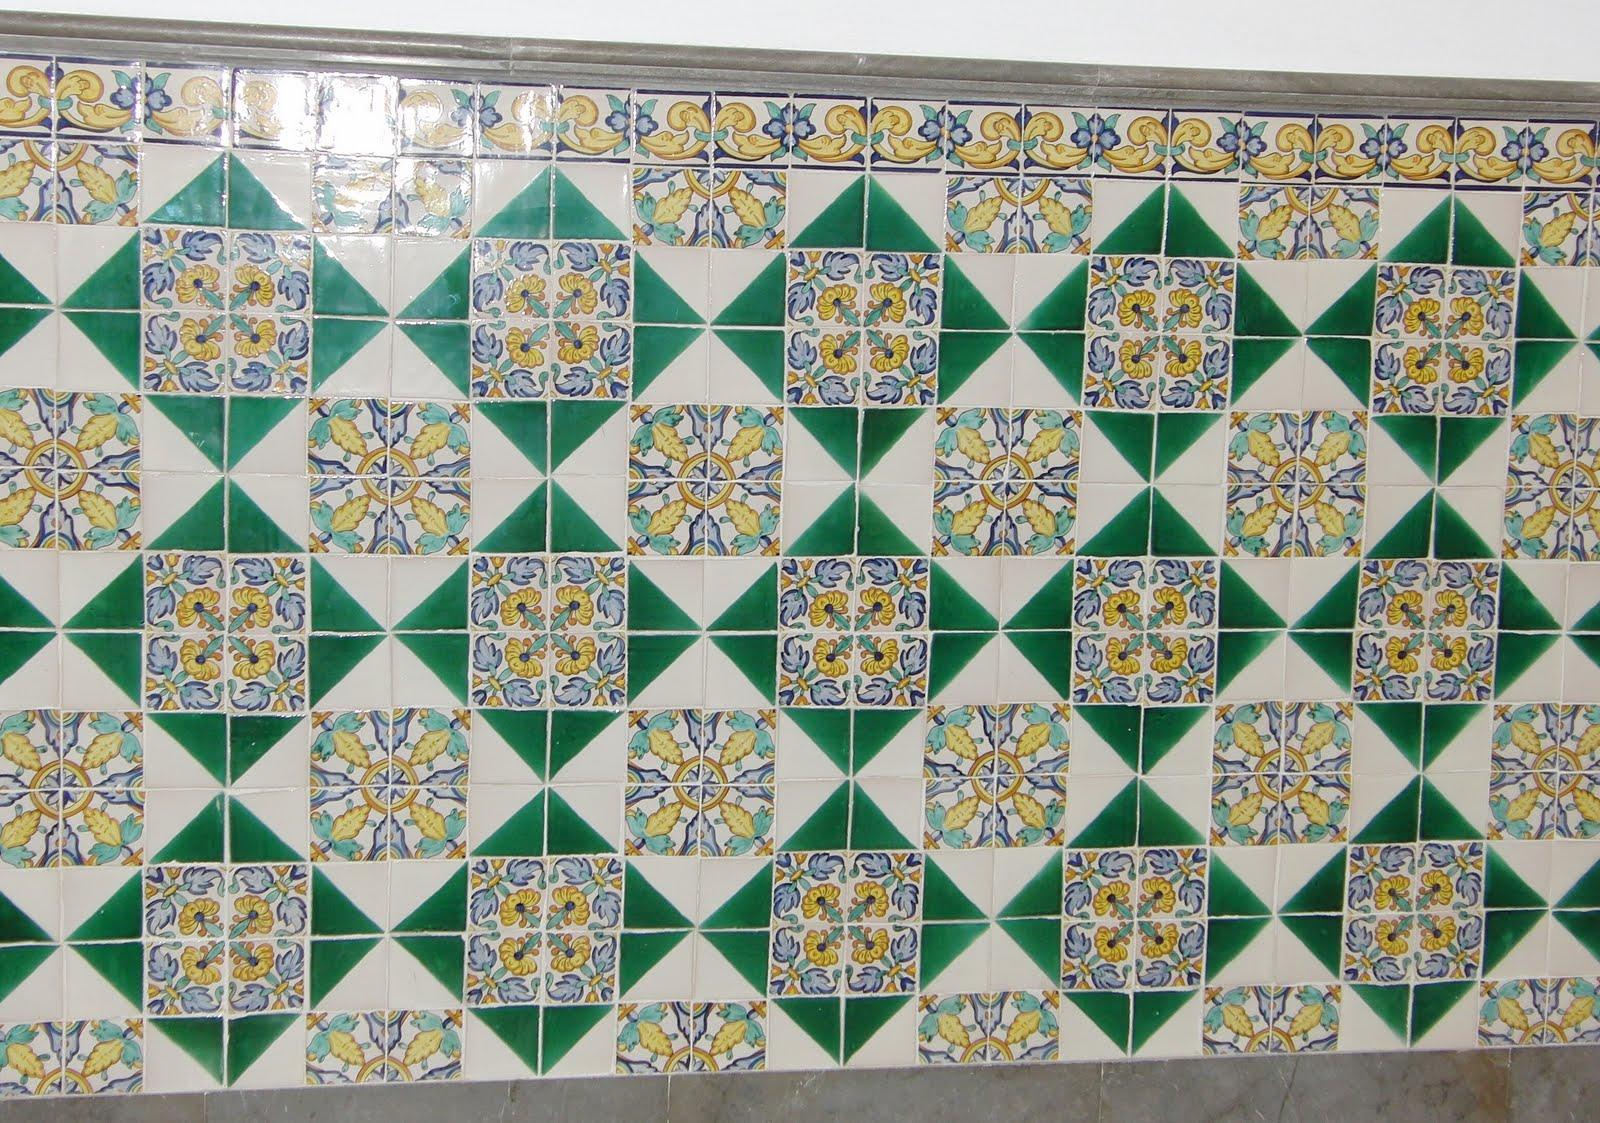 susannes sammelsurium azulejos sevillanos en antequera i. Black Bedroom Furniture Sets. Home Design Ideas